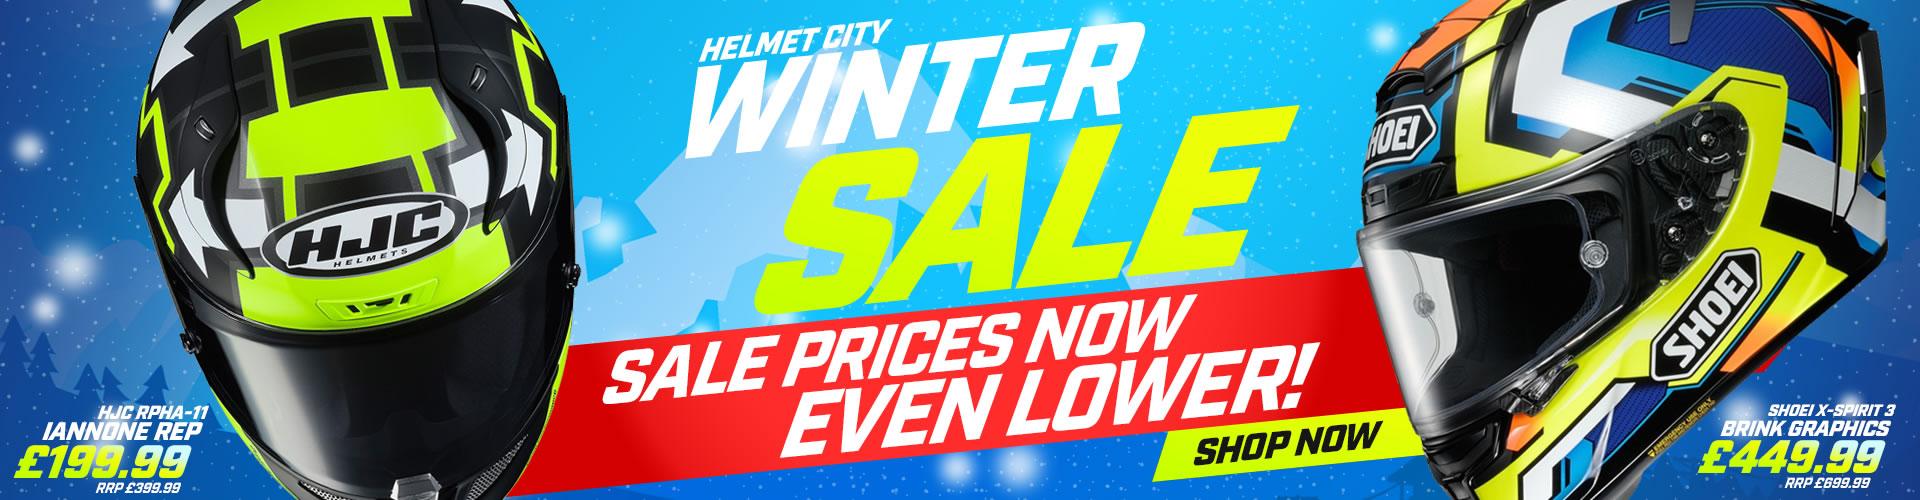 Winter SALE Helmets from Helmet City!